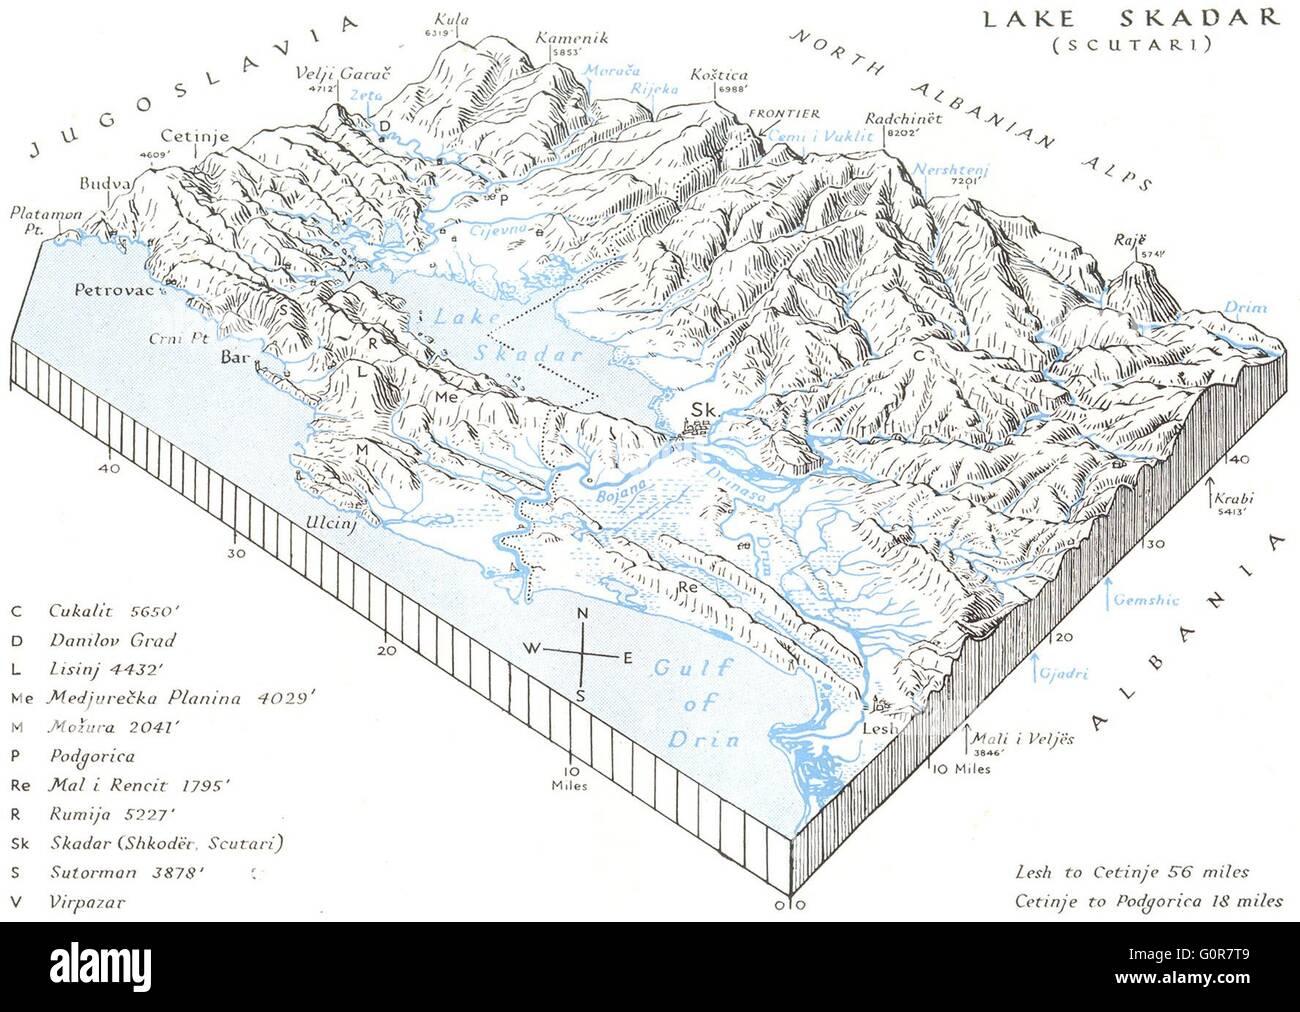 Lake Skadar Block Diagram S Coasts Uskudar Vintage